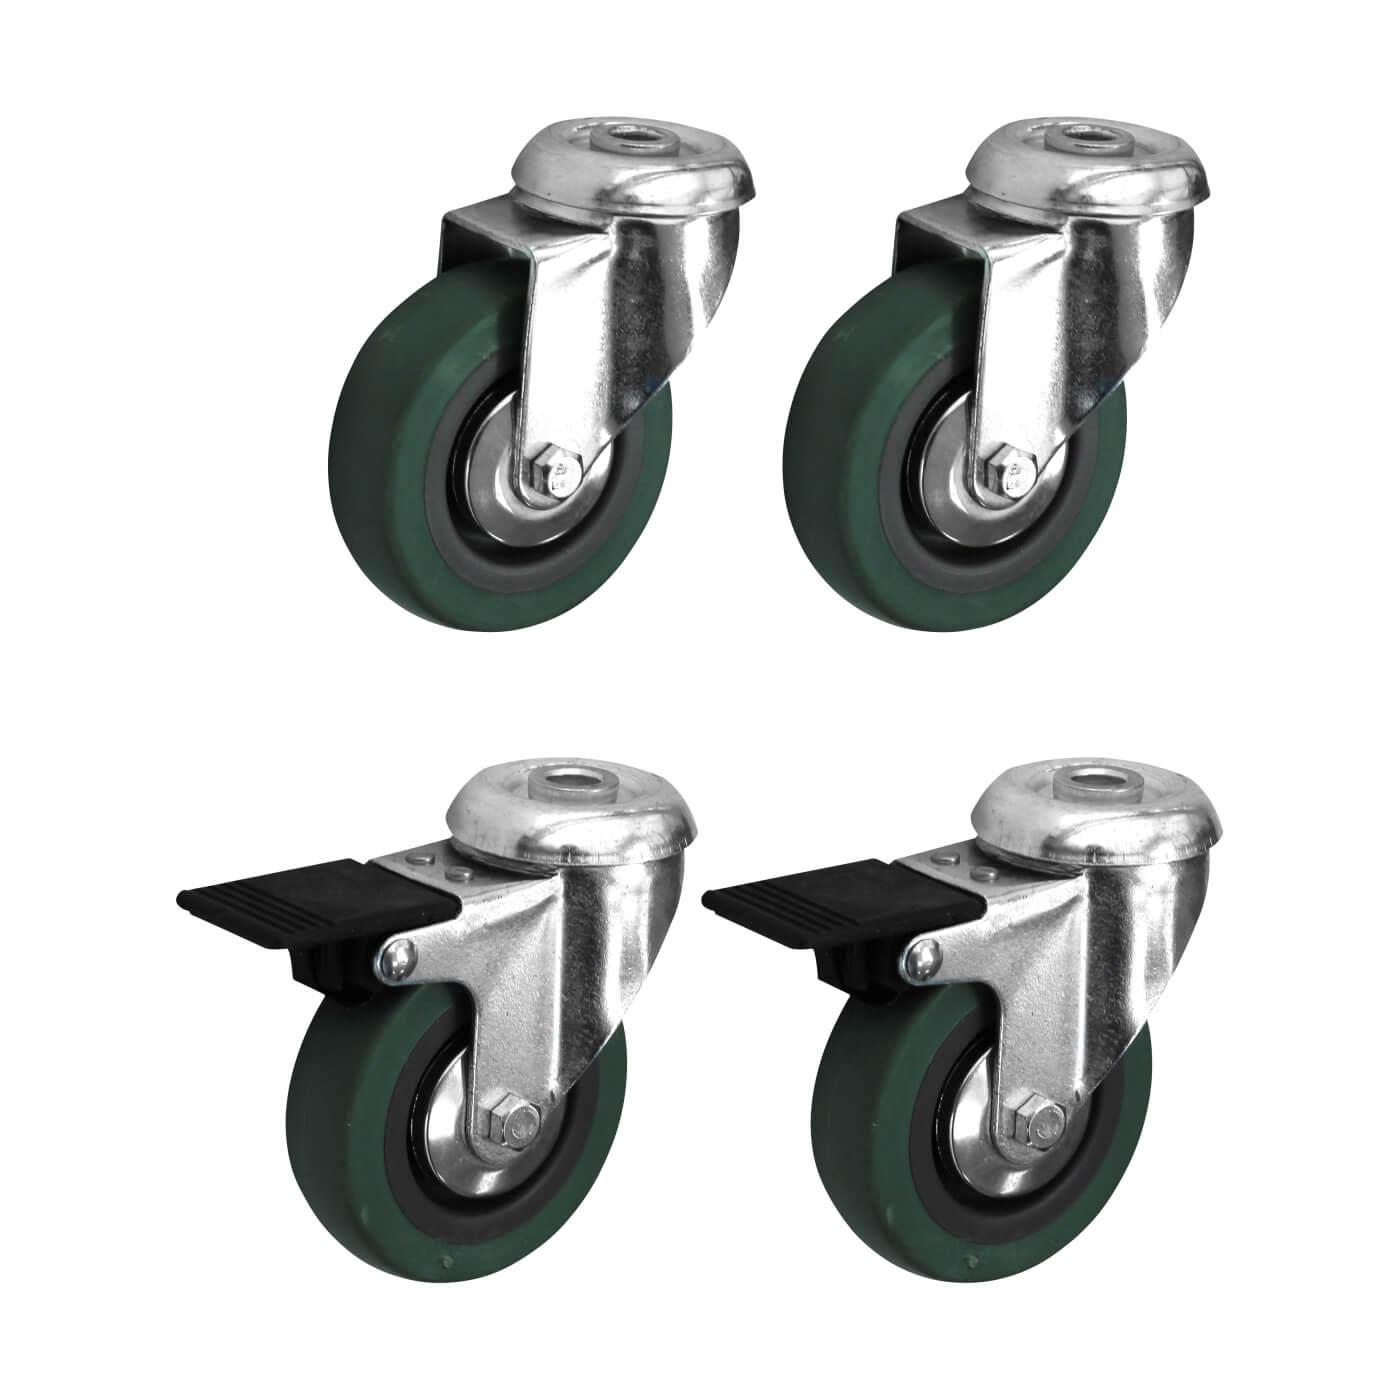 Coldene Castor Pack - 2 x Bolt Hole, 2 x Bolt Hole with Brake - 90kg Maximum Weight - Grey)